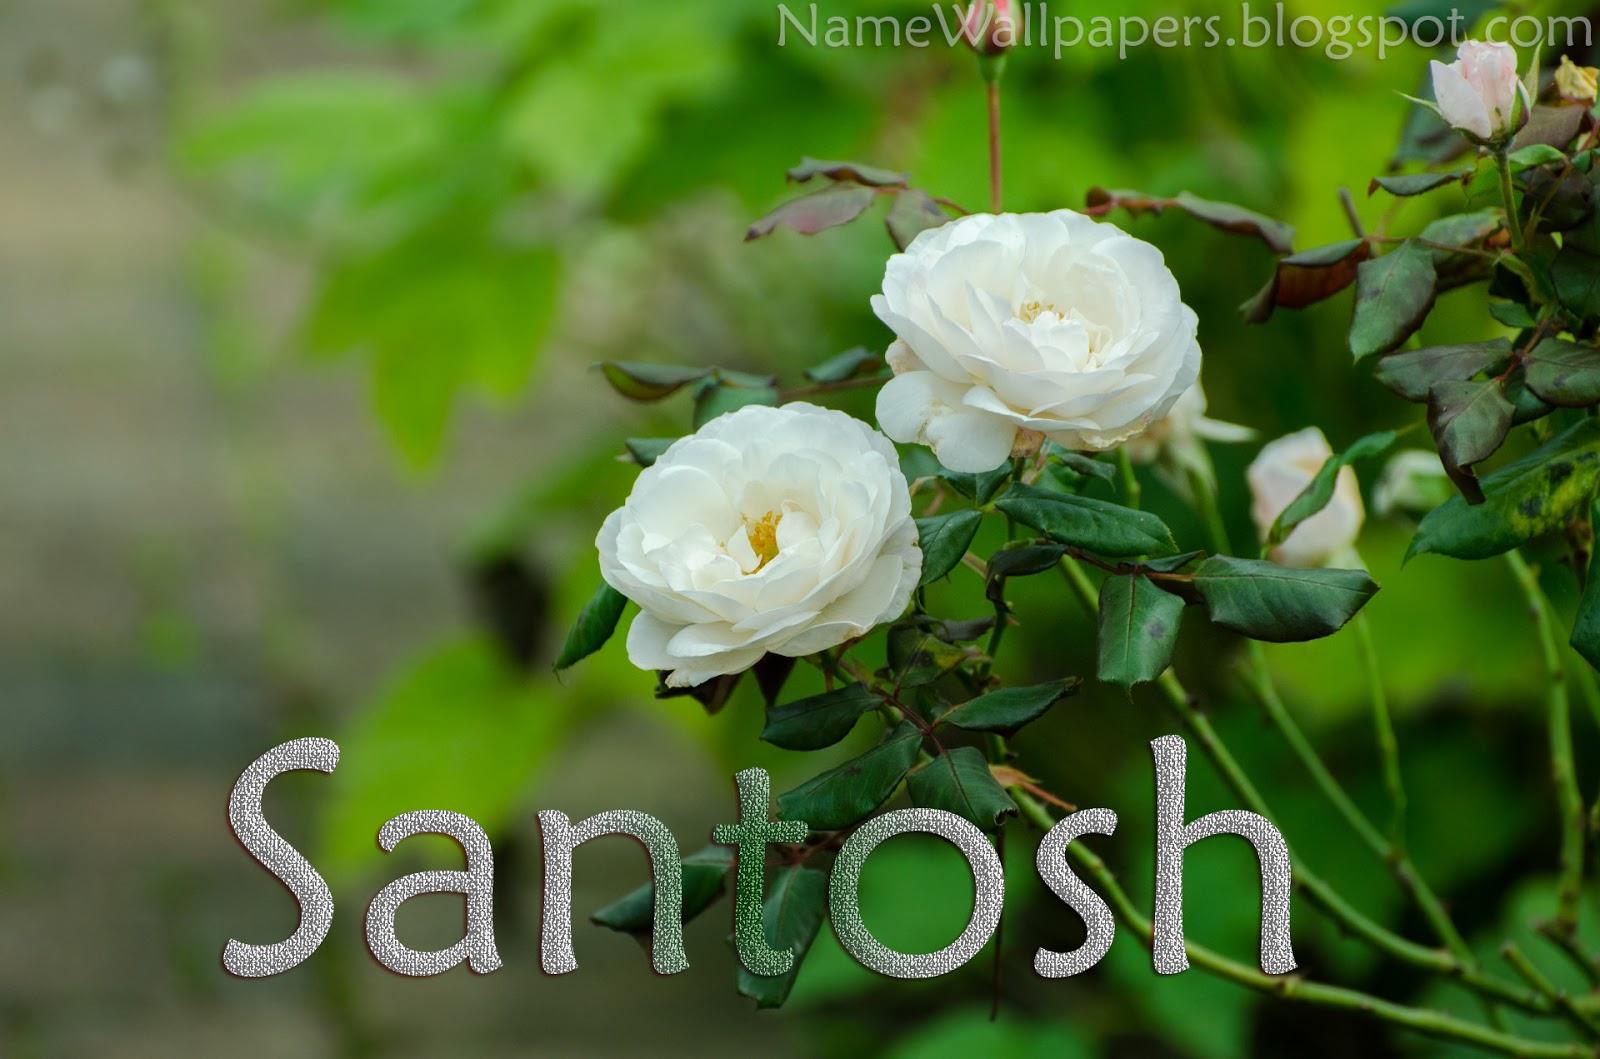 Wallpaper Hd Online Santosh Name Wallpapers